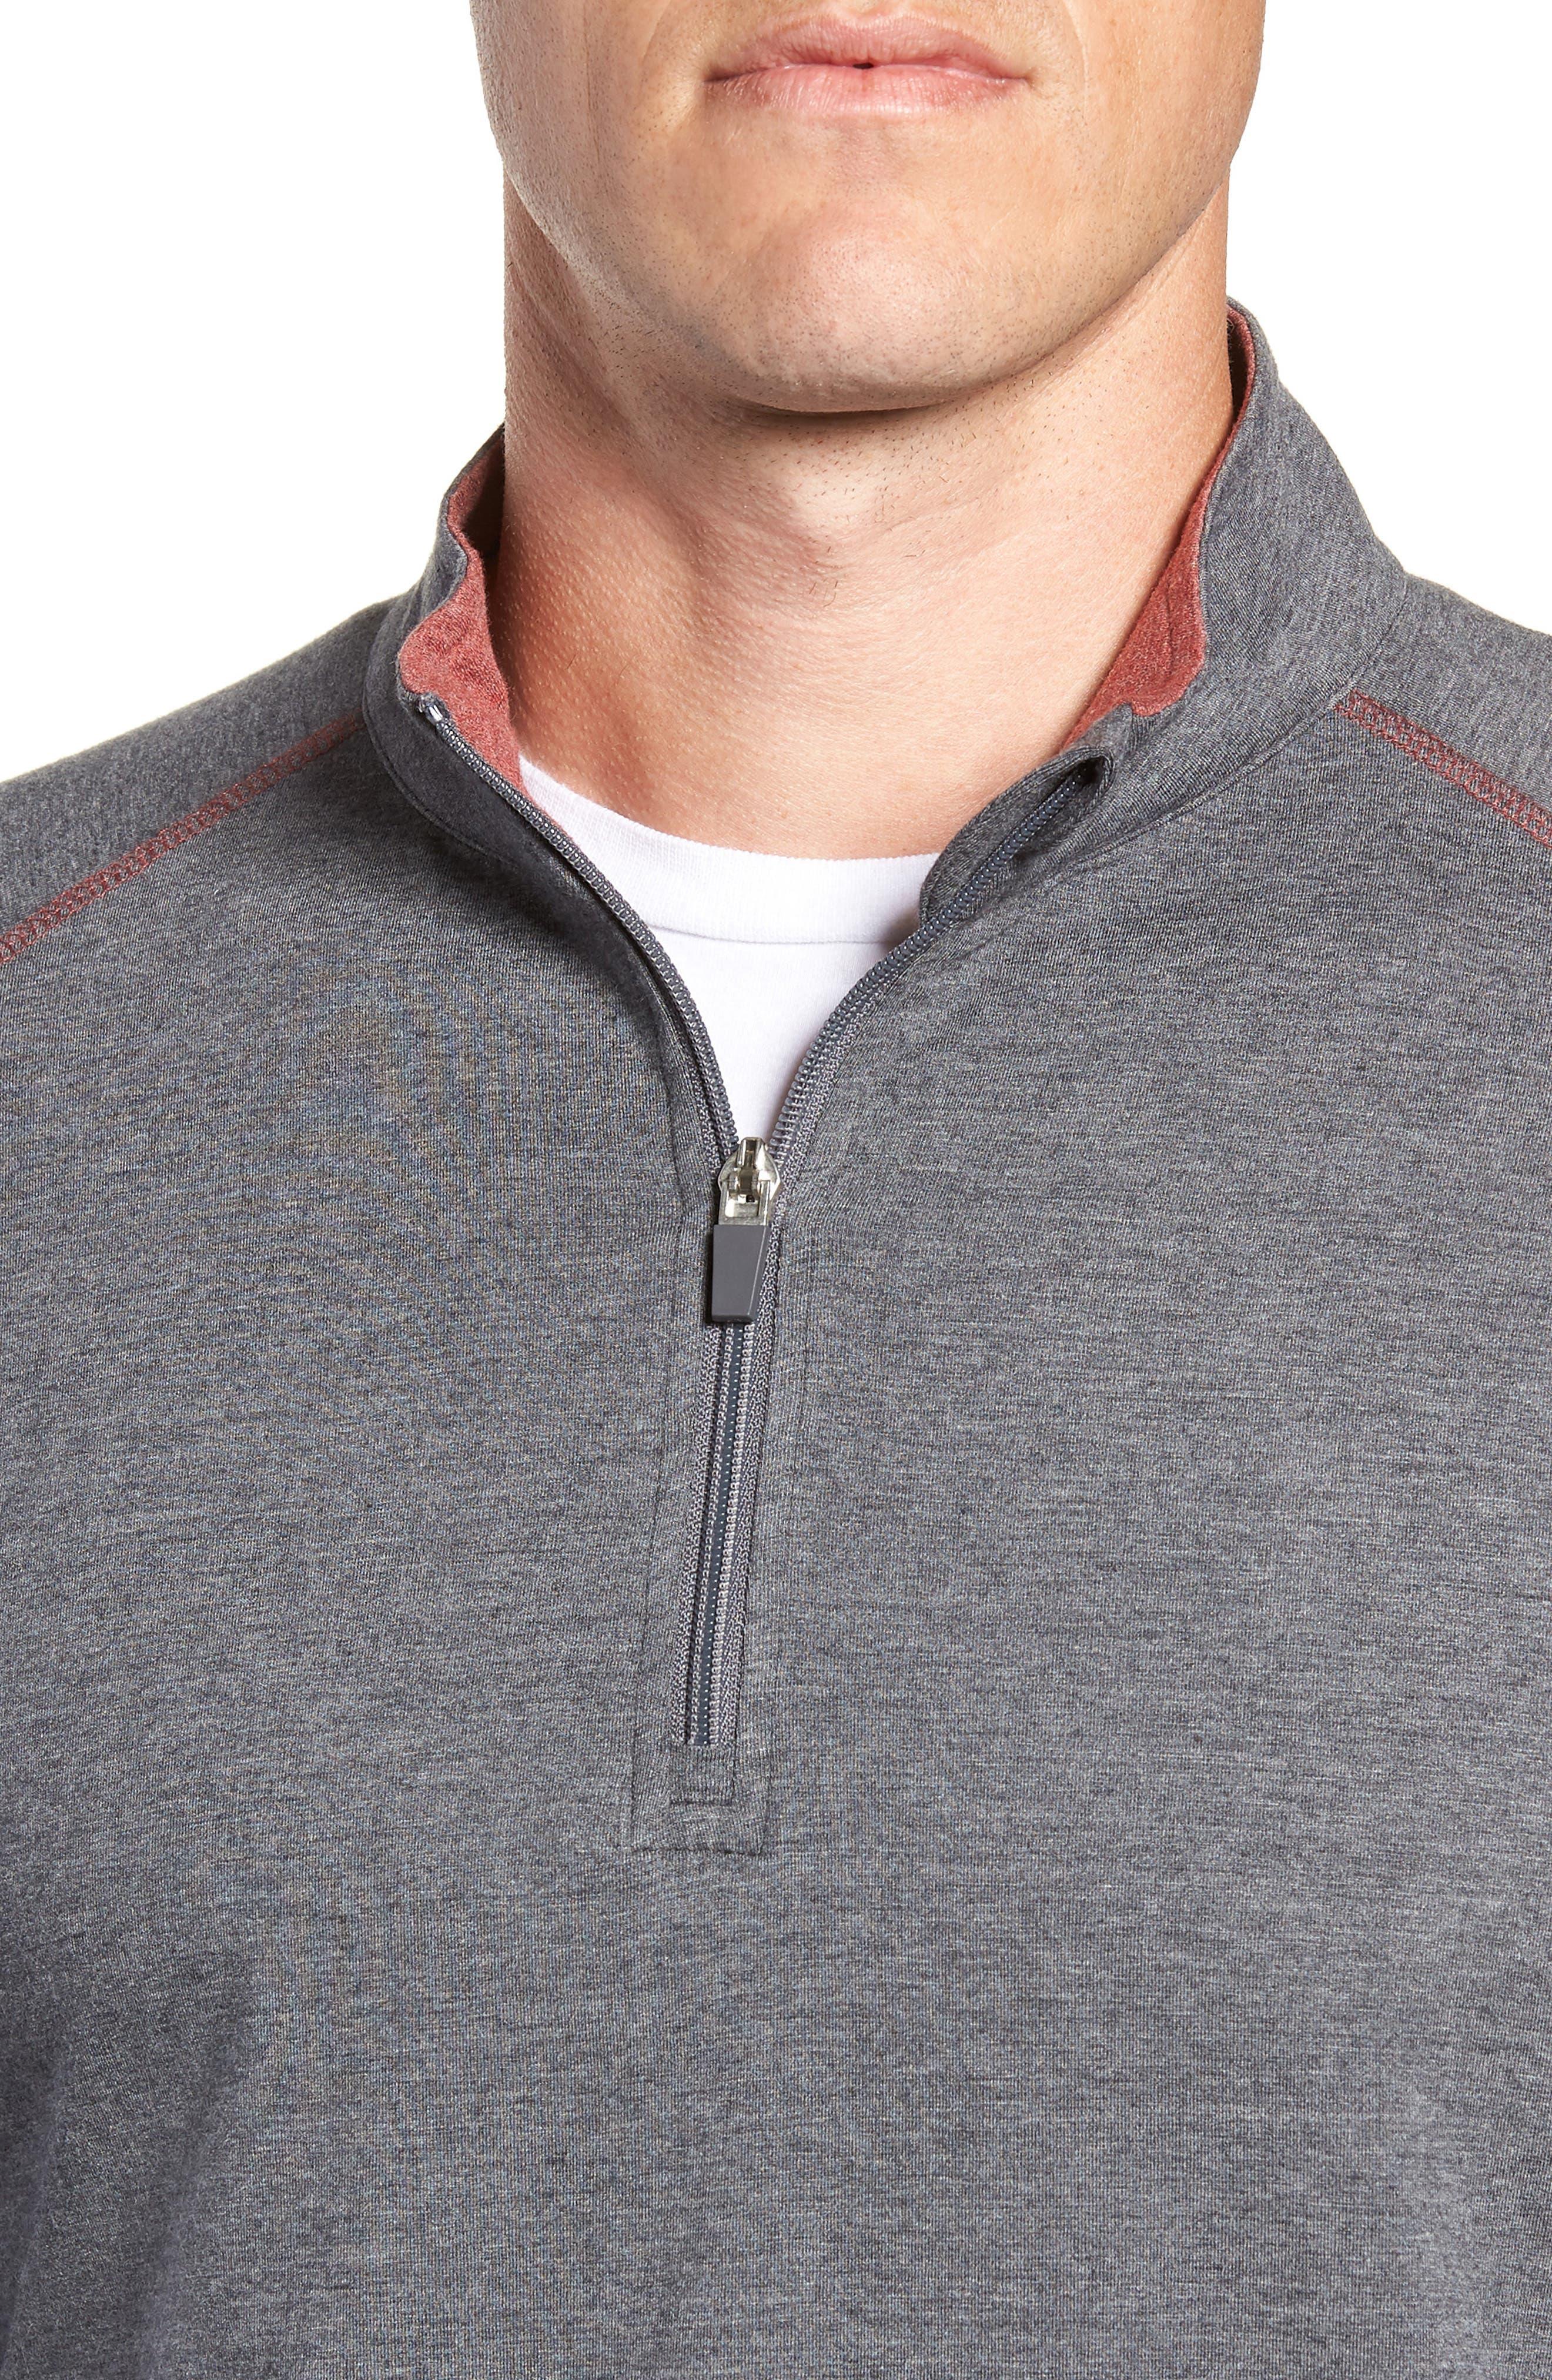 TASC PERFORMANCE, Carrollton Quarter Zip Sweatshirt, Alternate thumbnail 4, color, BLACK HEATHER/ MERCURY